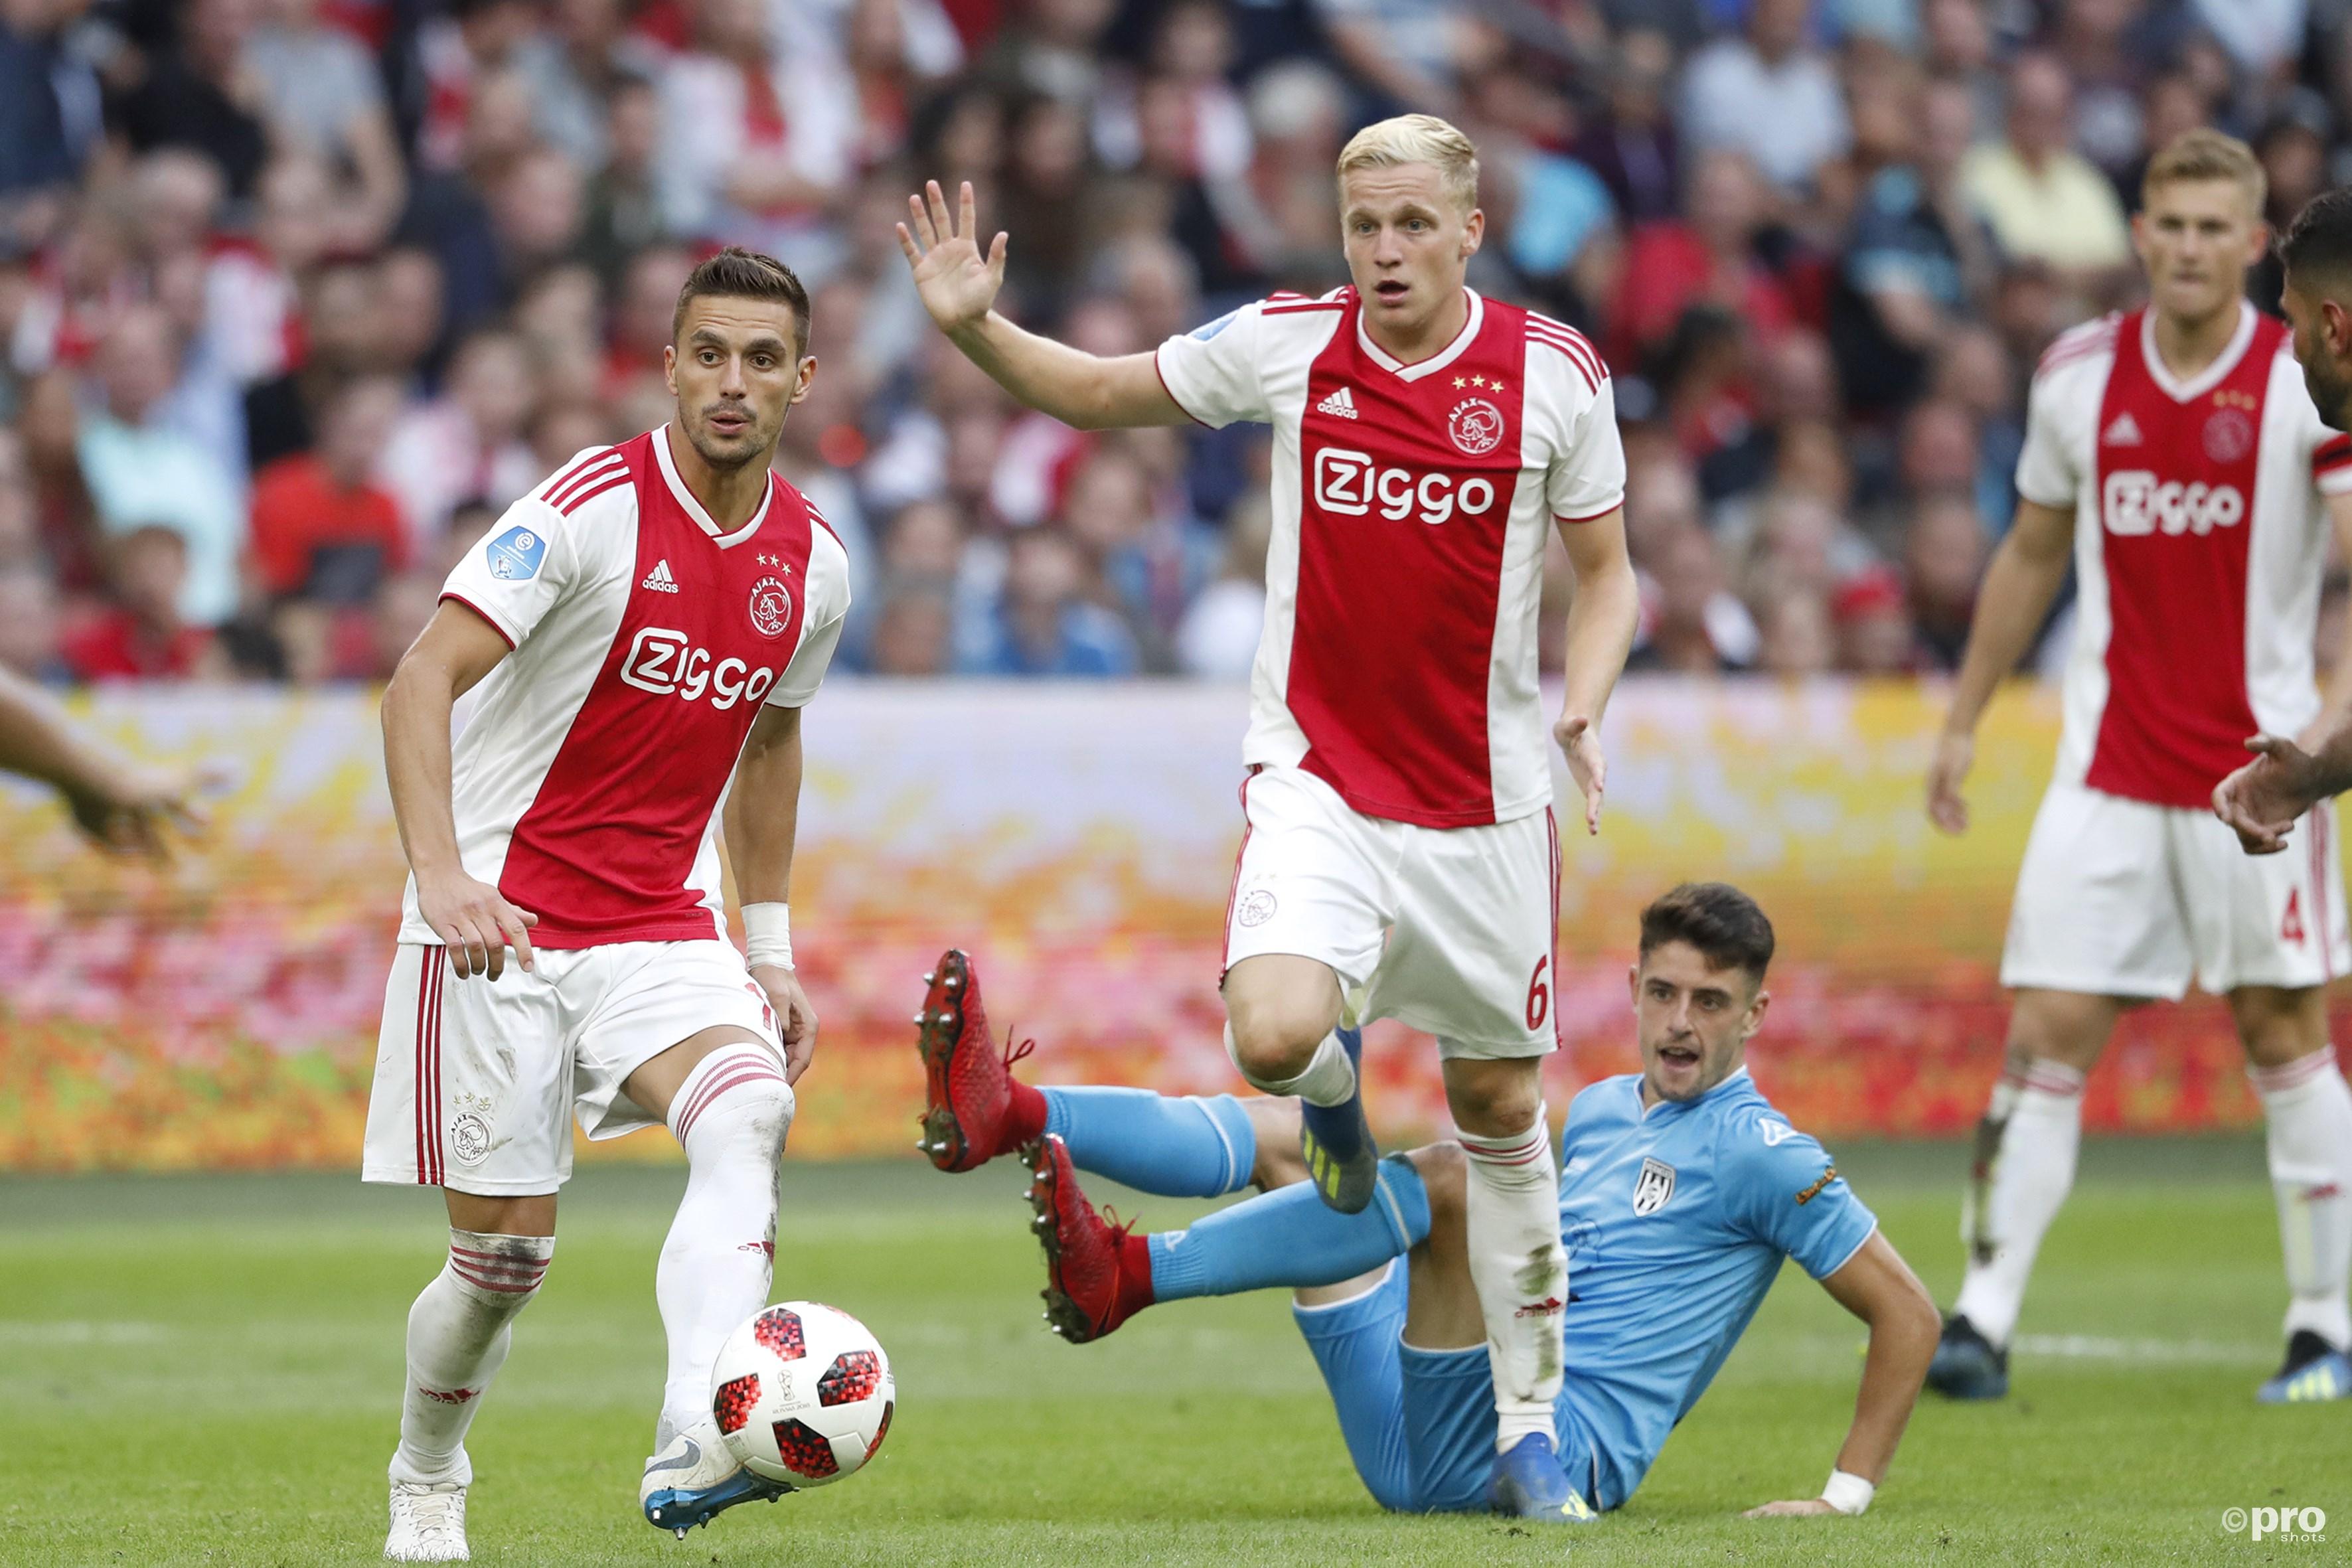 Dusan Tadic (L) Donny van de Beek (M) en Heracles-player Adrian Dalmau (R). (PRO SHOTS/Stanley Gontha)